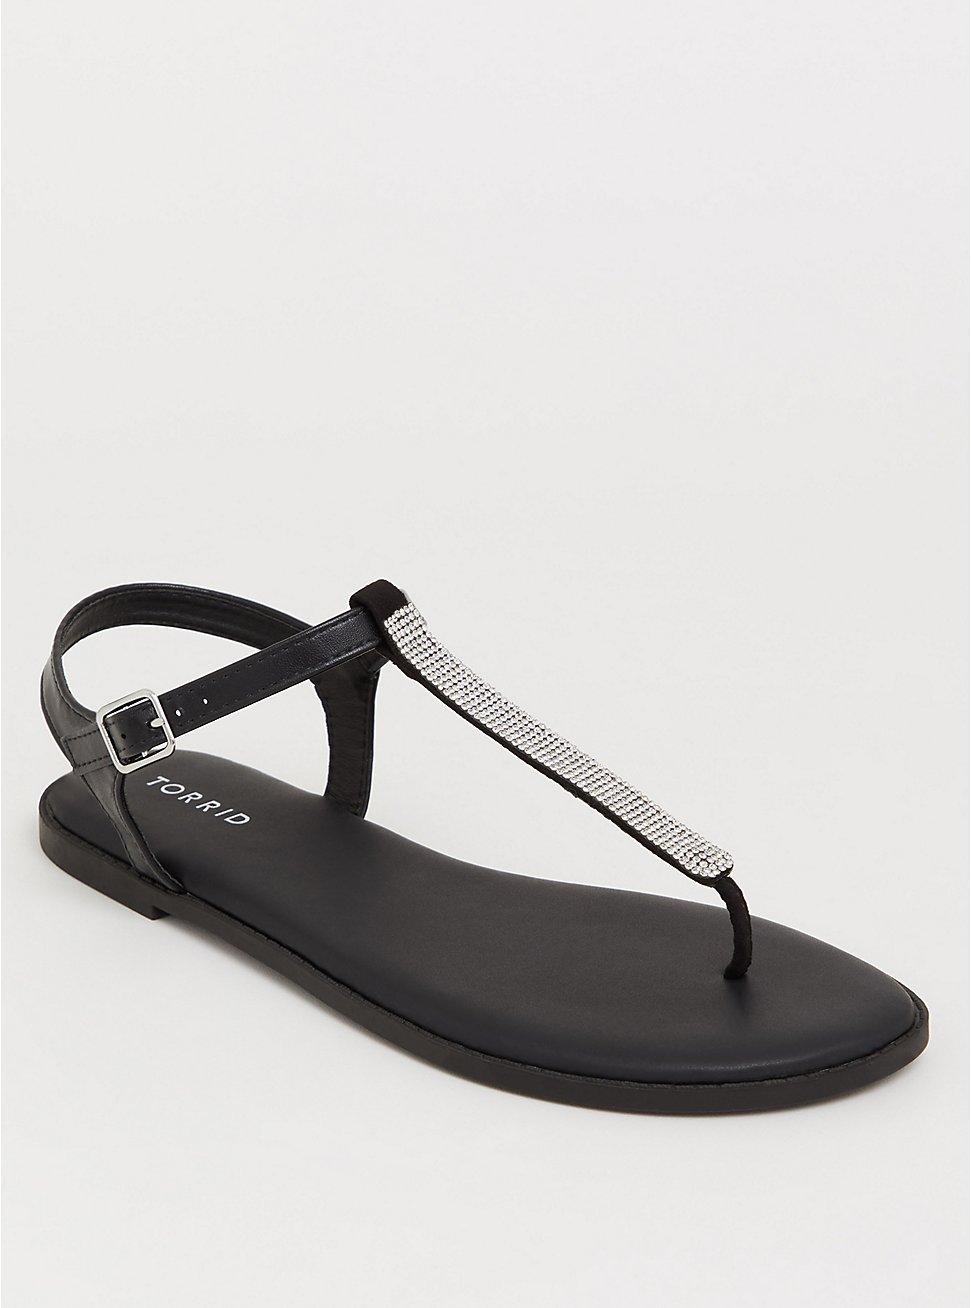 Plus Size Black Rhinestone T-Strap Sandal (WW), BLACK, hi-res